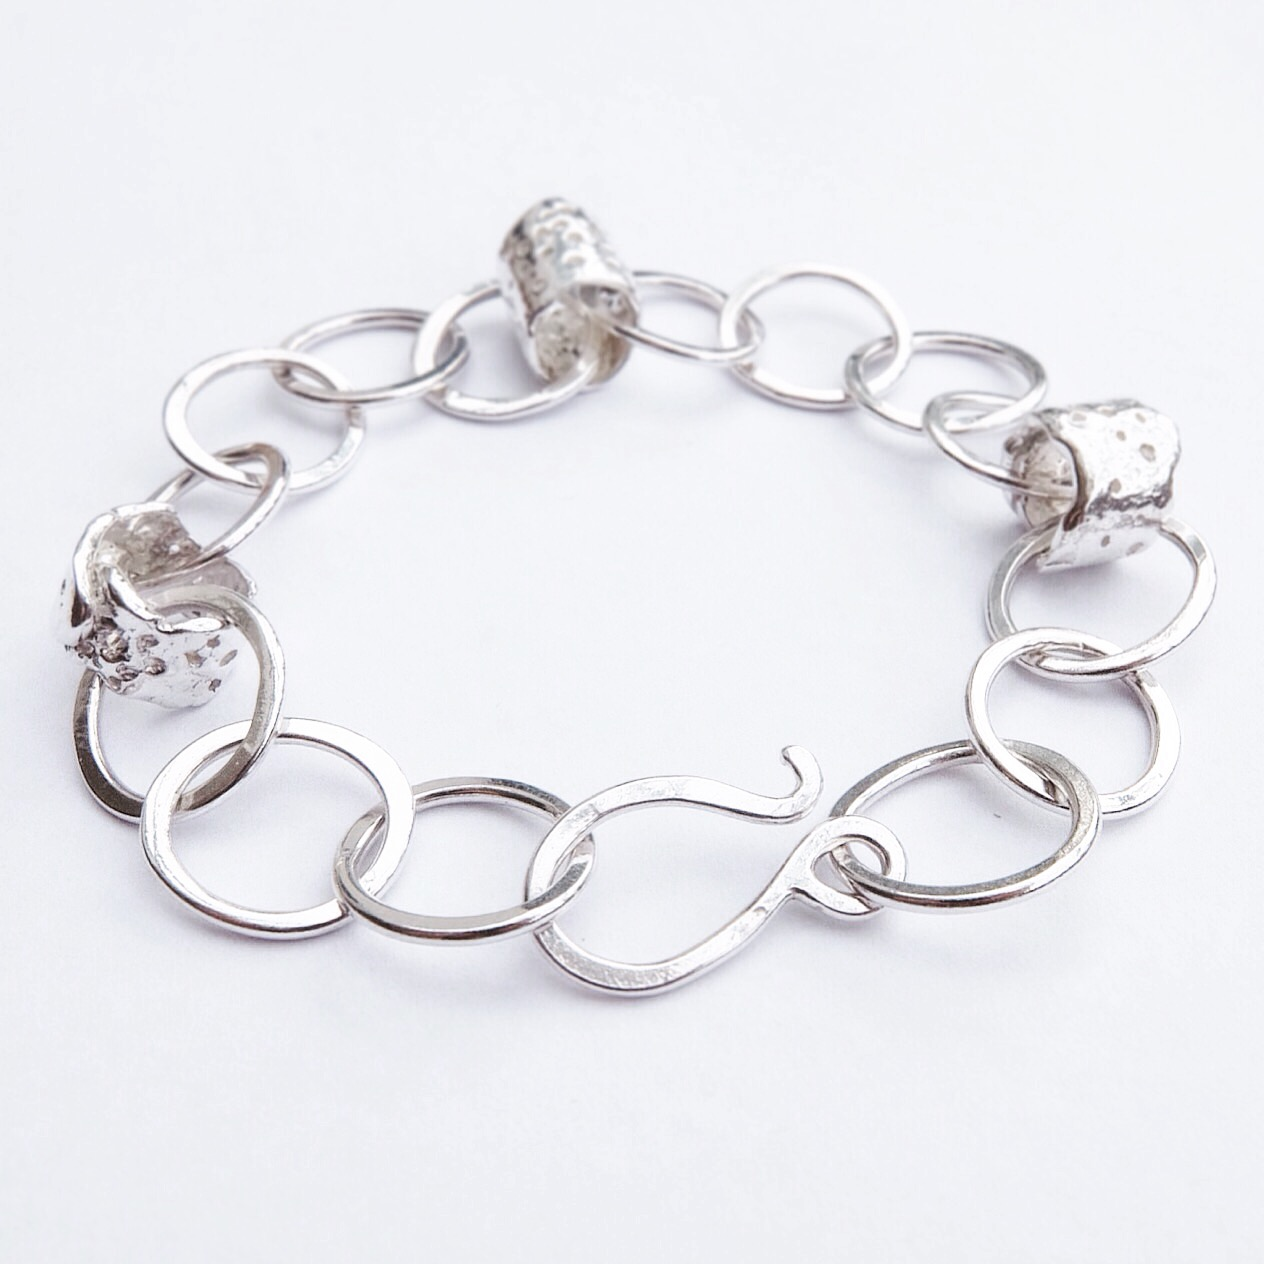 Sterling Silver Sea Sponge Handmade Chain Bracelet